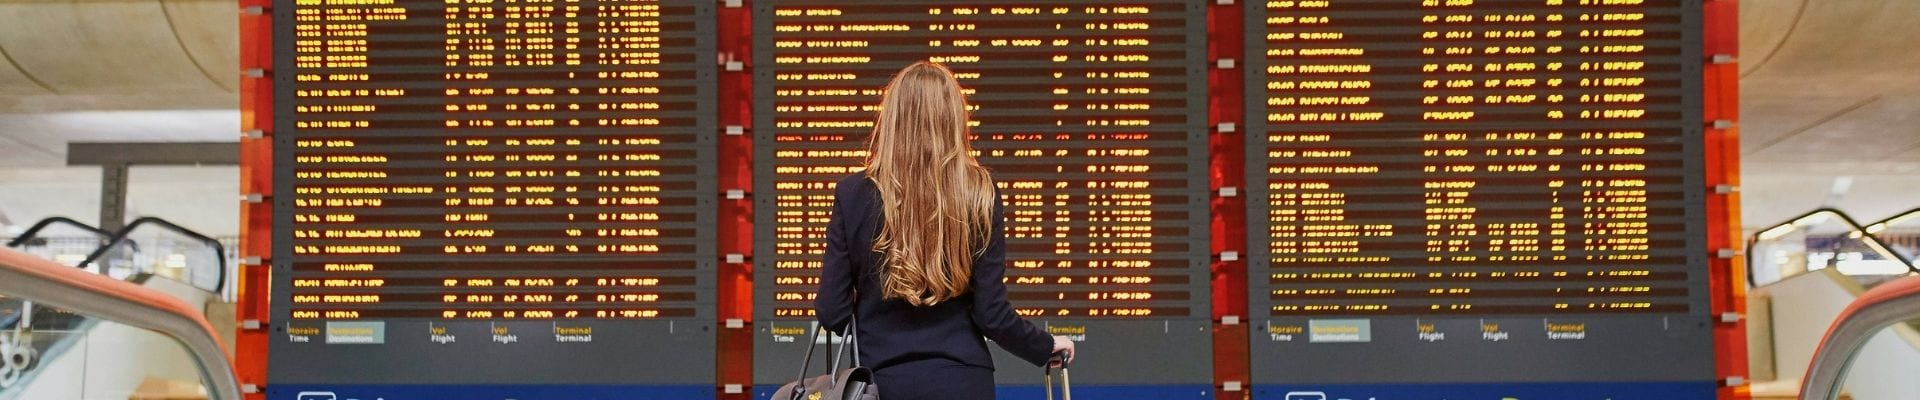 travellers links